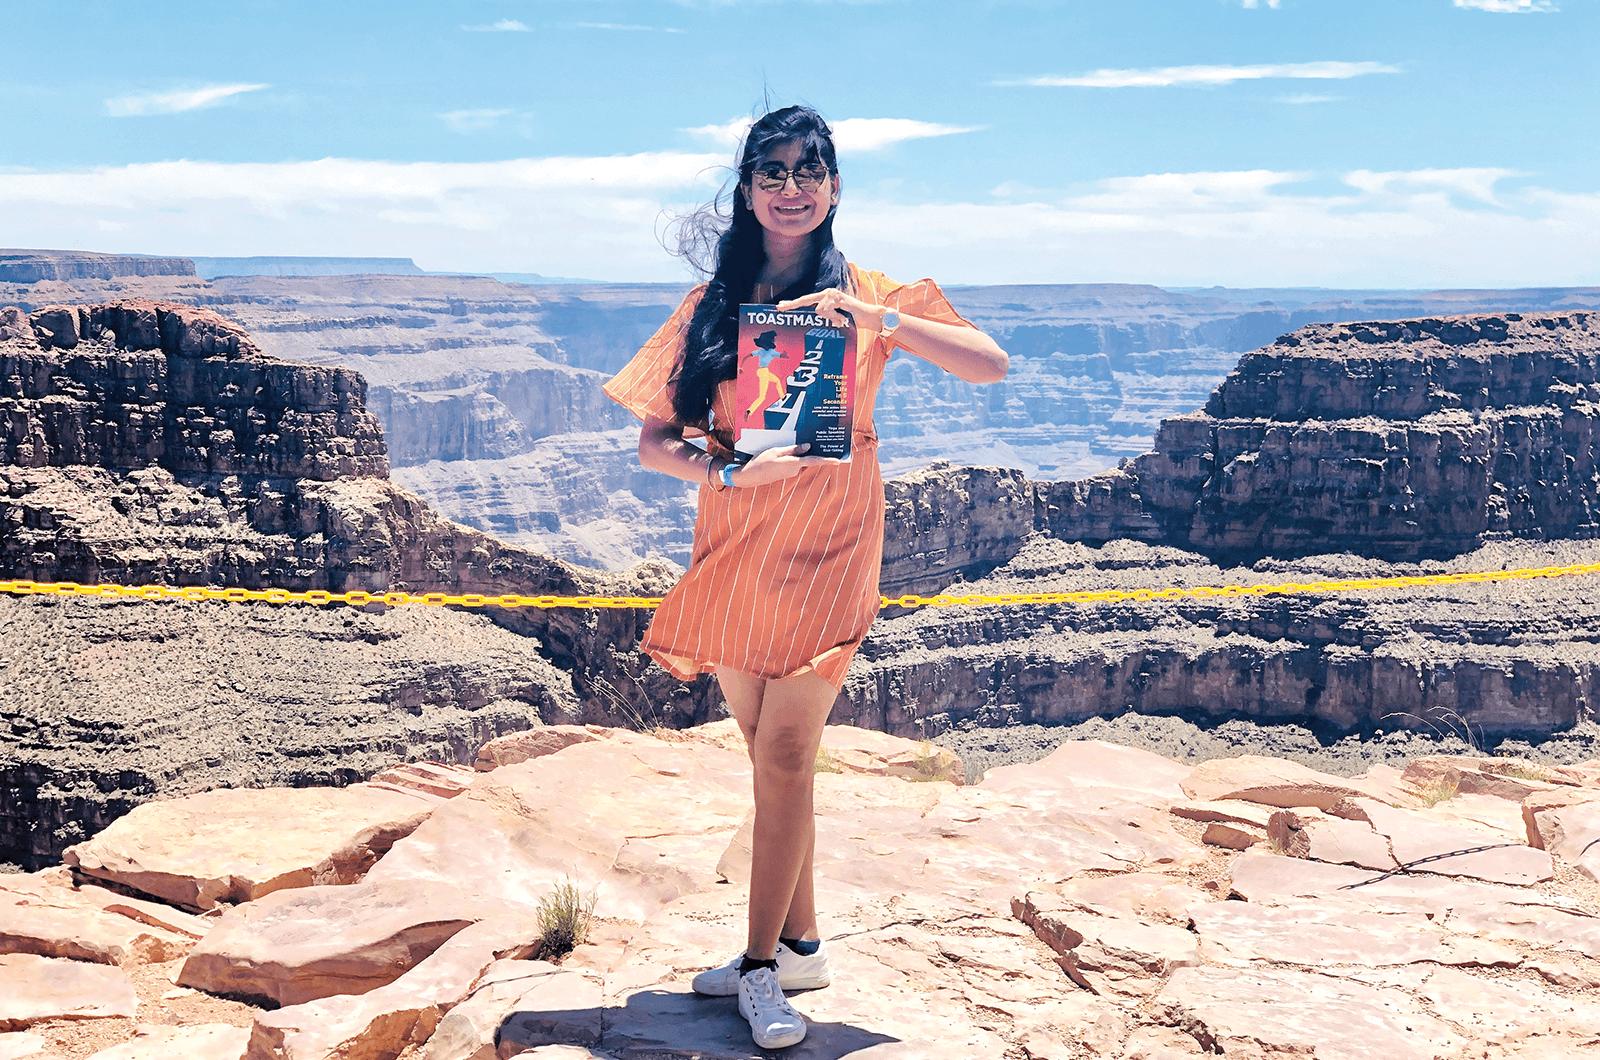 Meghashree Kar of Hyderabad, Telangana, India, stands near the edge of the Grand Canyon in Arizona.